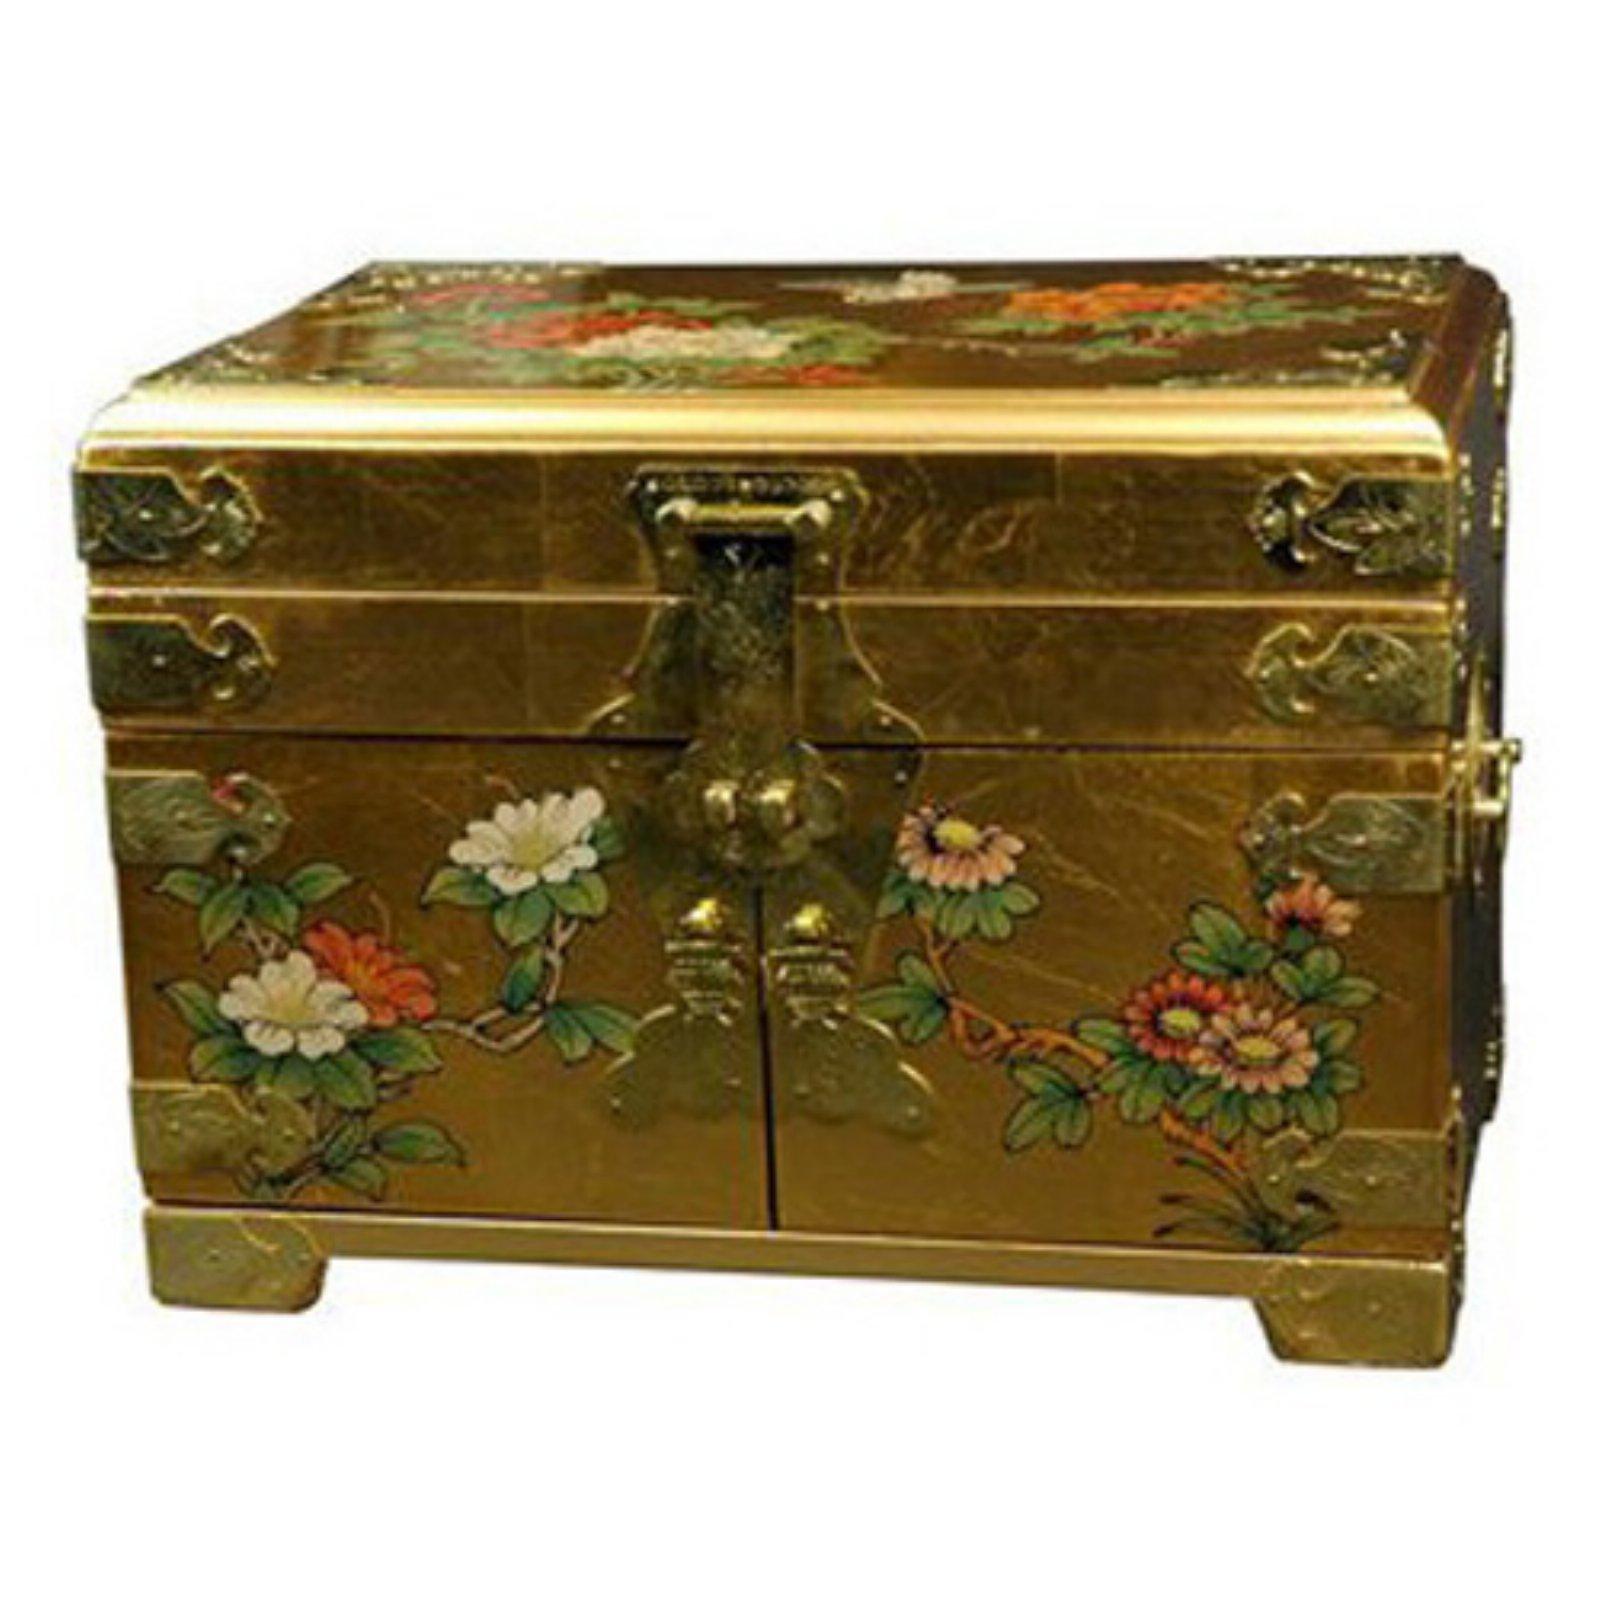 Oriental Furniture Daisi Jewelry Box - Gold